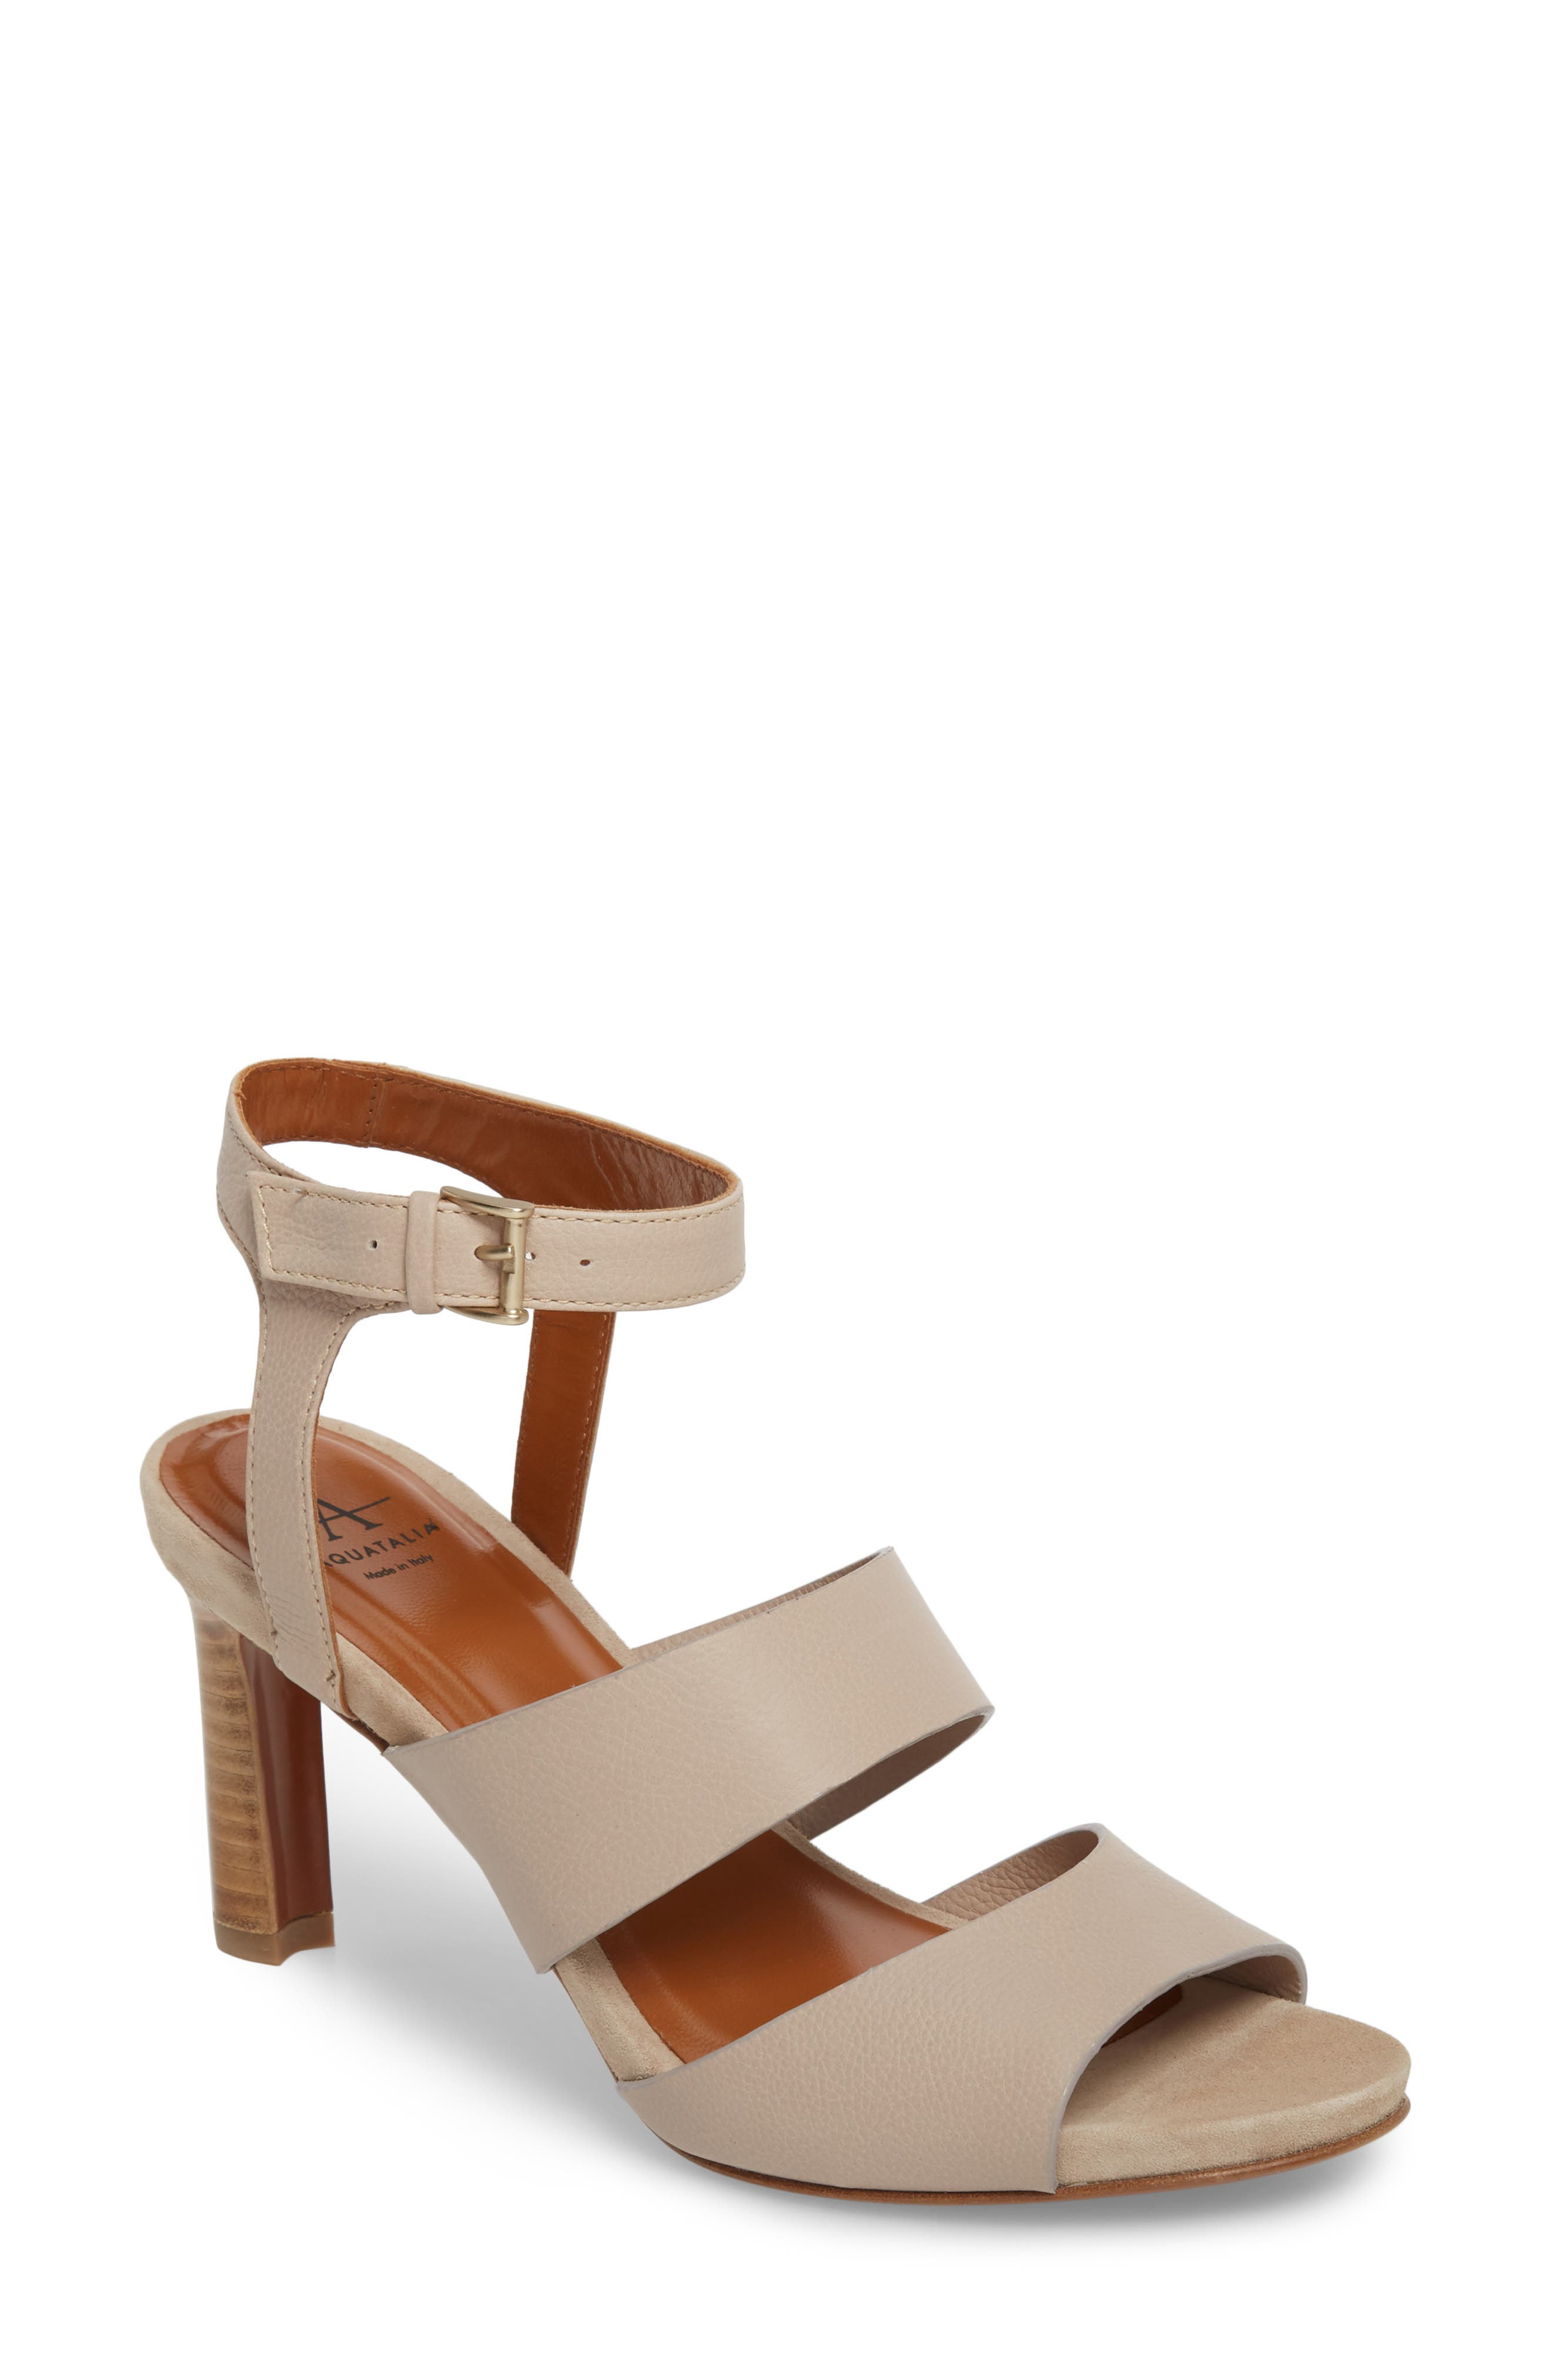 Aquatalia Women's Basha Ankle Strap Sandal T6WhXOJV